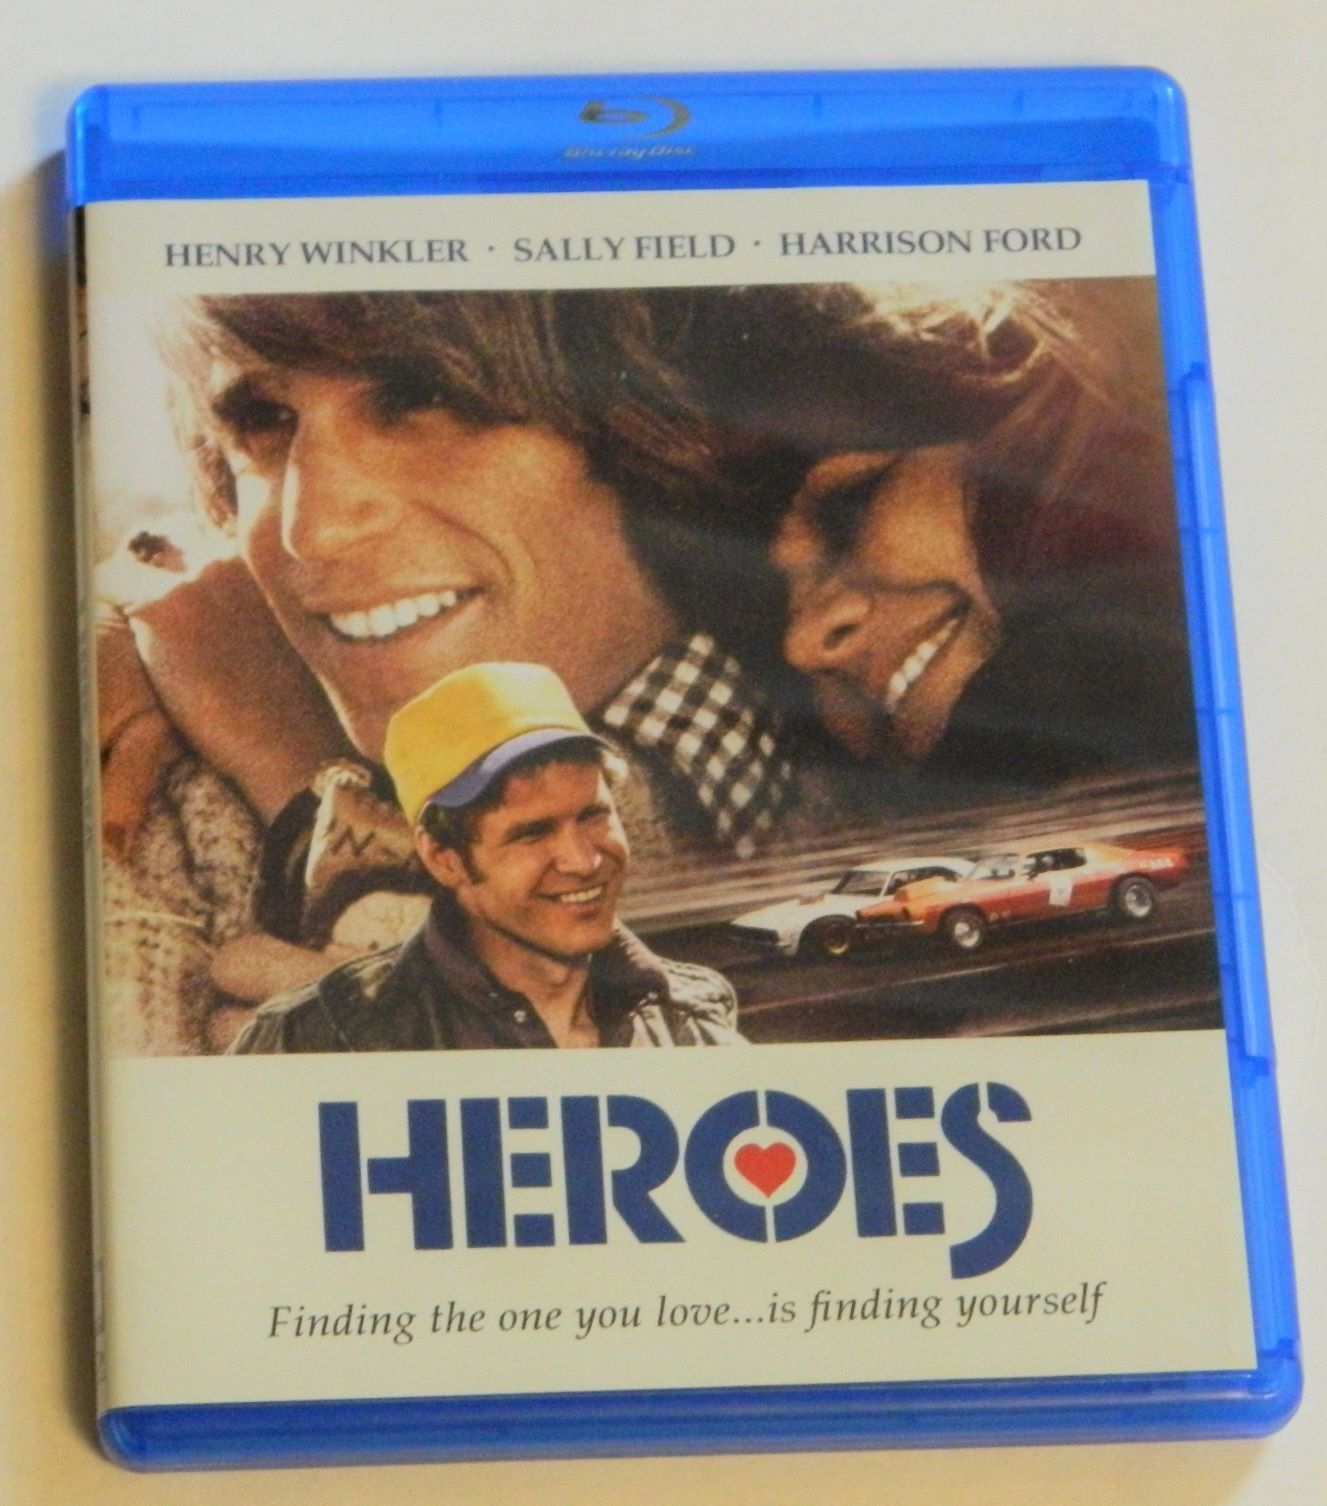 Heroes Blu-ray